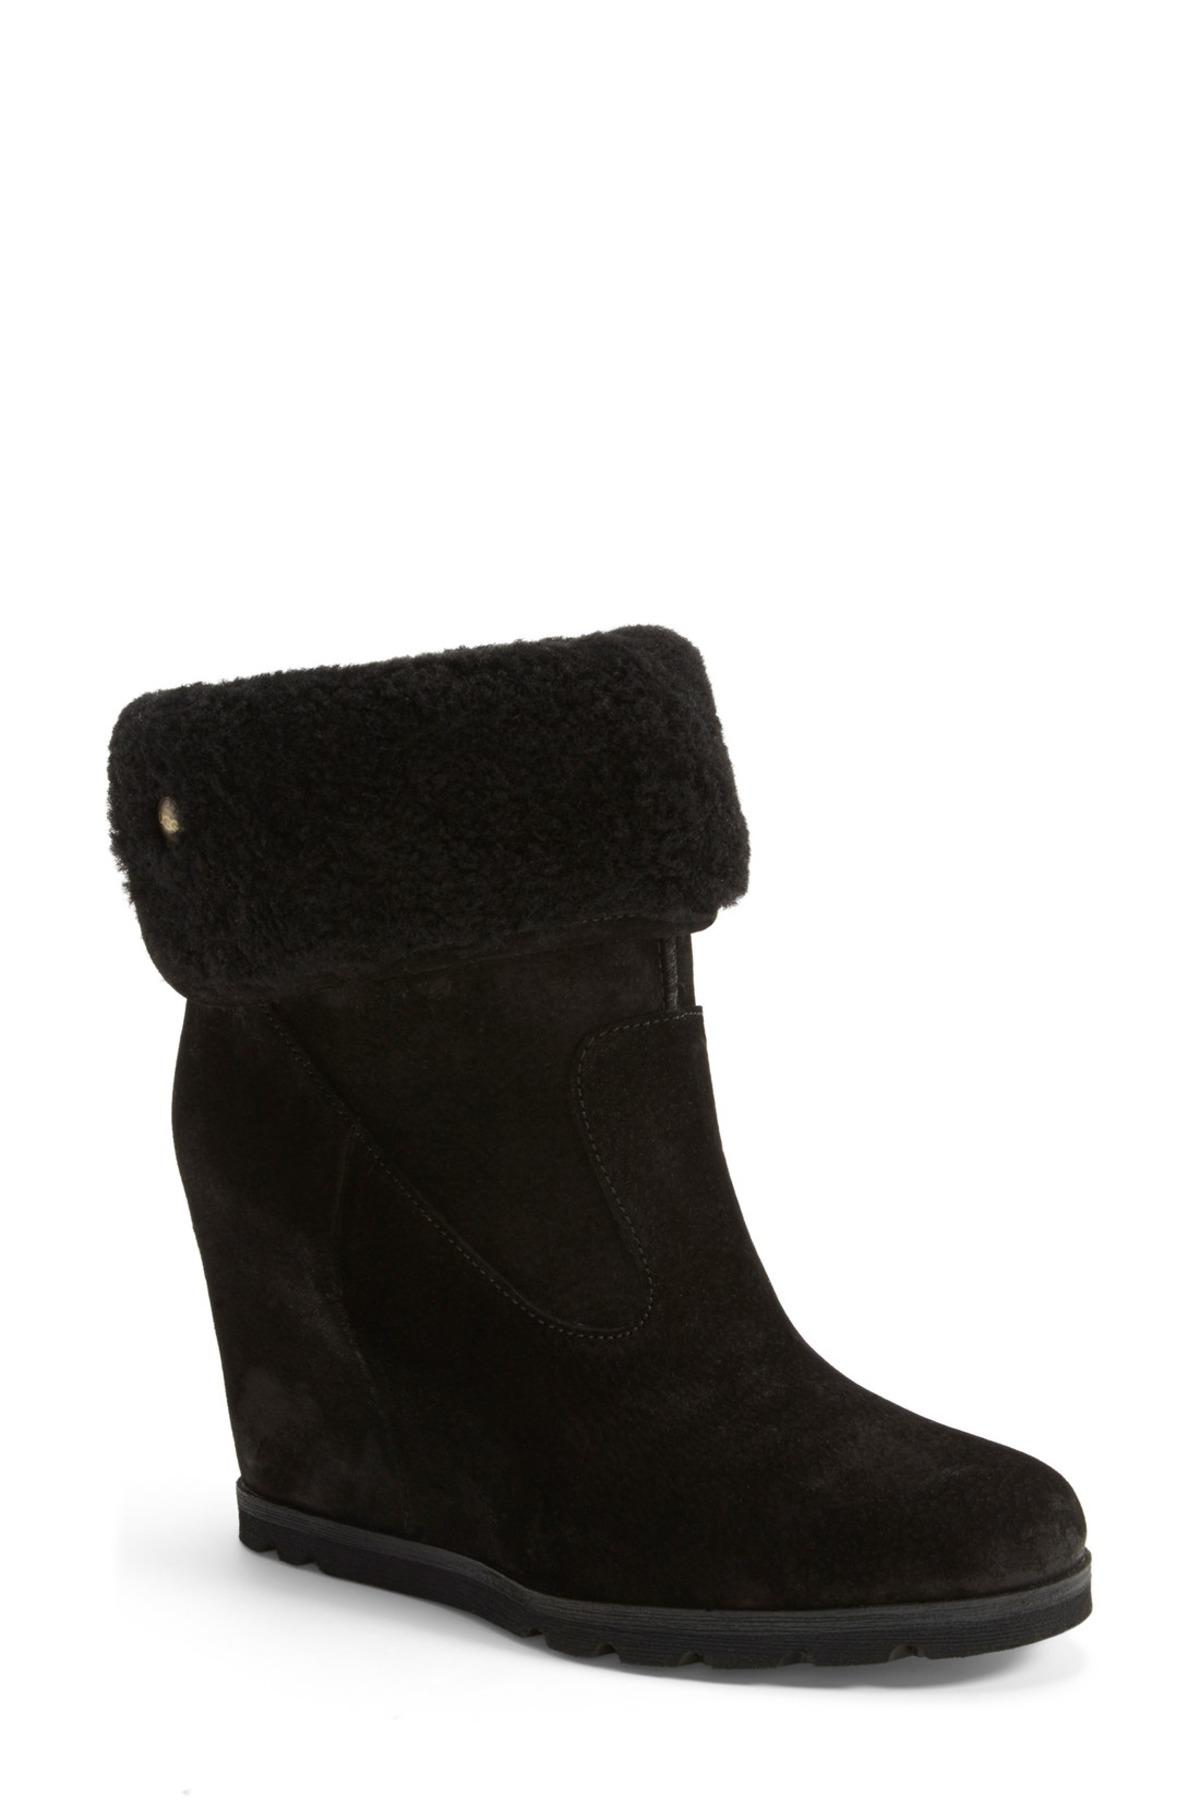 ceeb2705474 Lyst - UGG Kyra Genuine Shearling Wedge Boot in Black